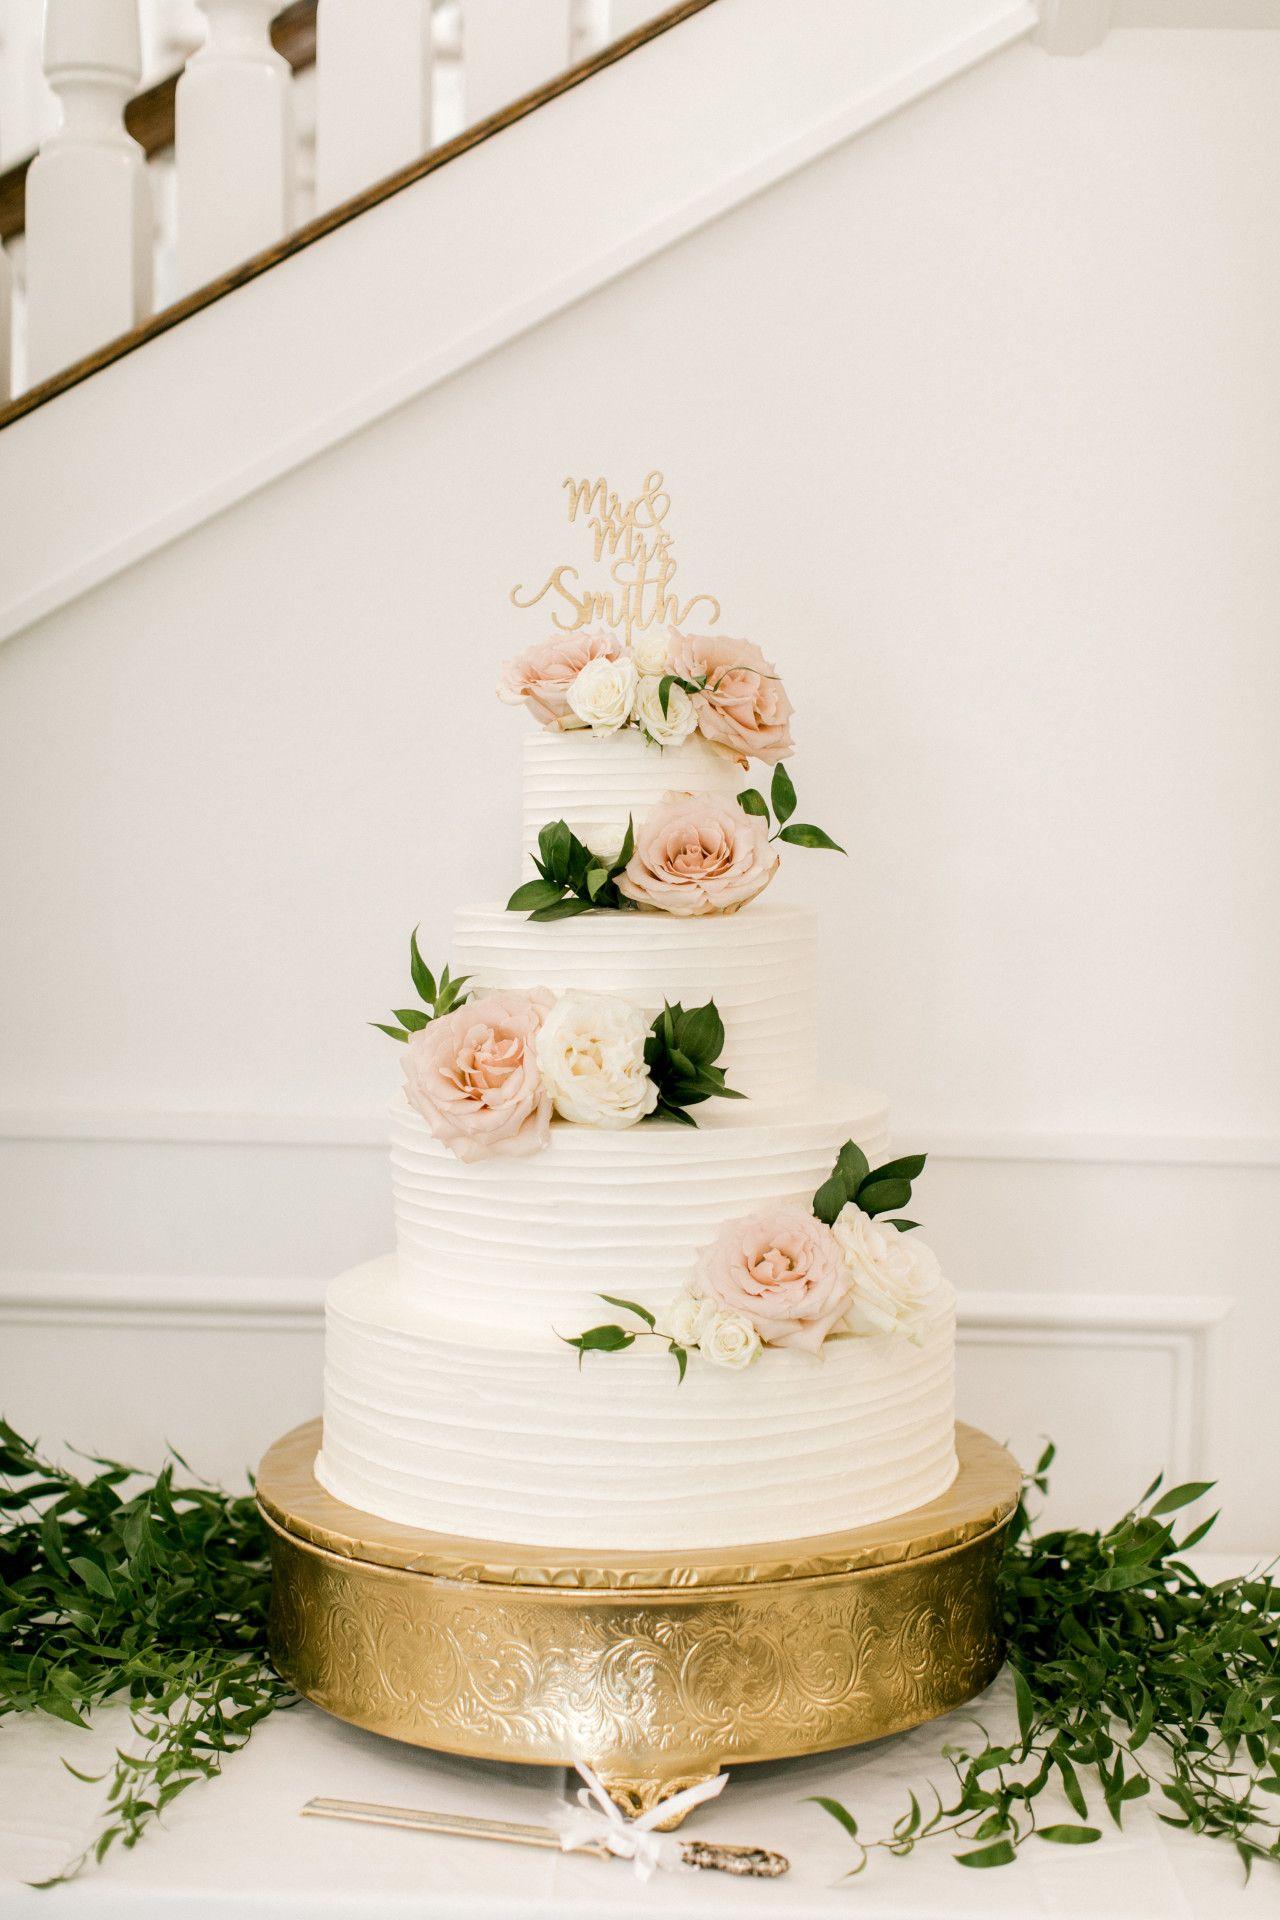 Weatherford Wedding Venue Floral Wedding Cakes Wedding Cake